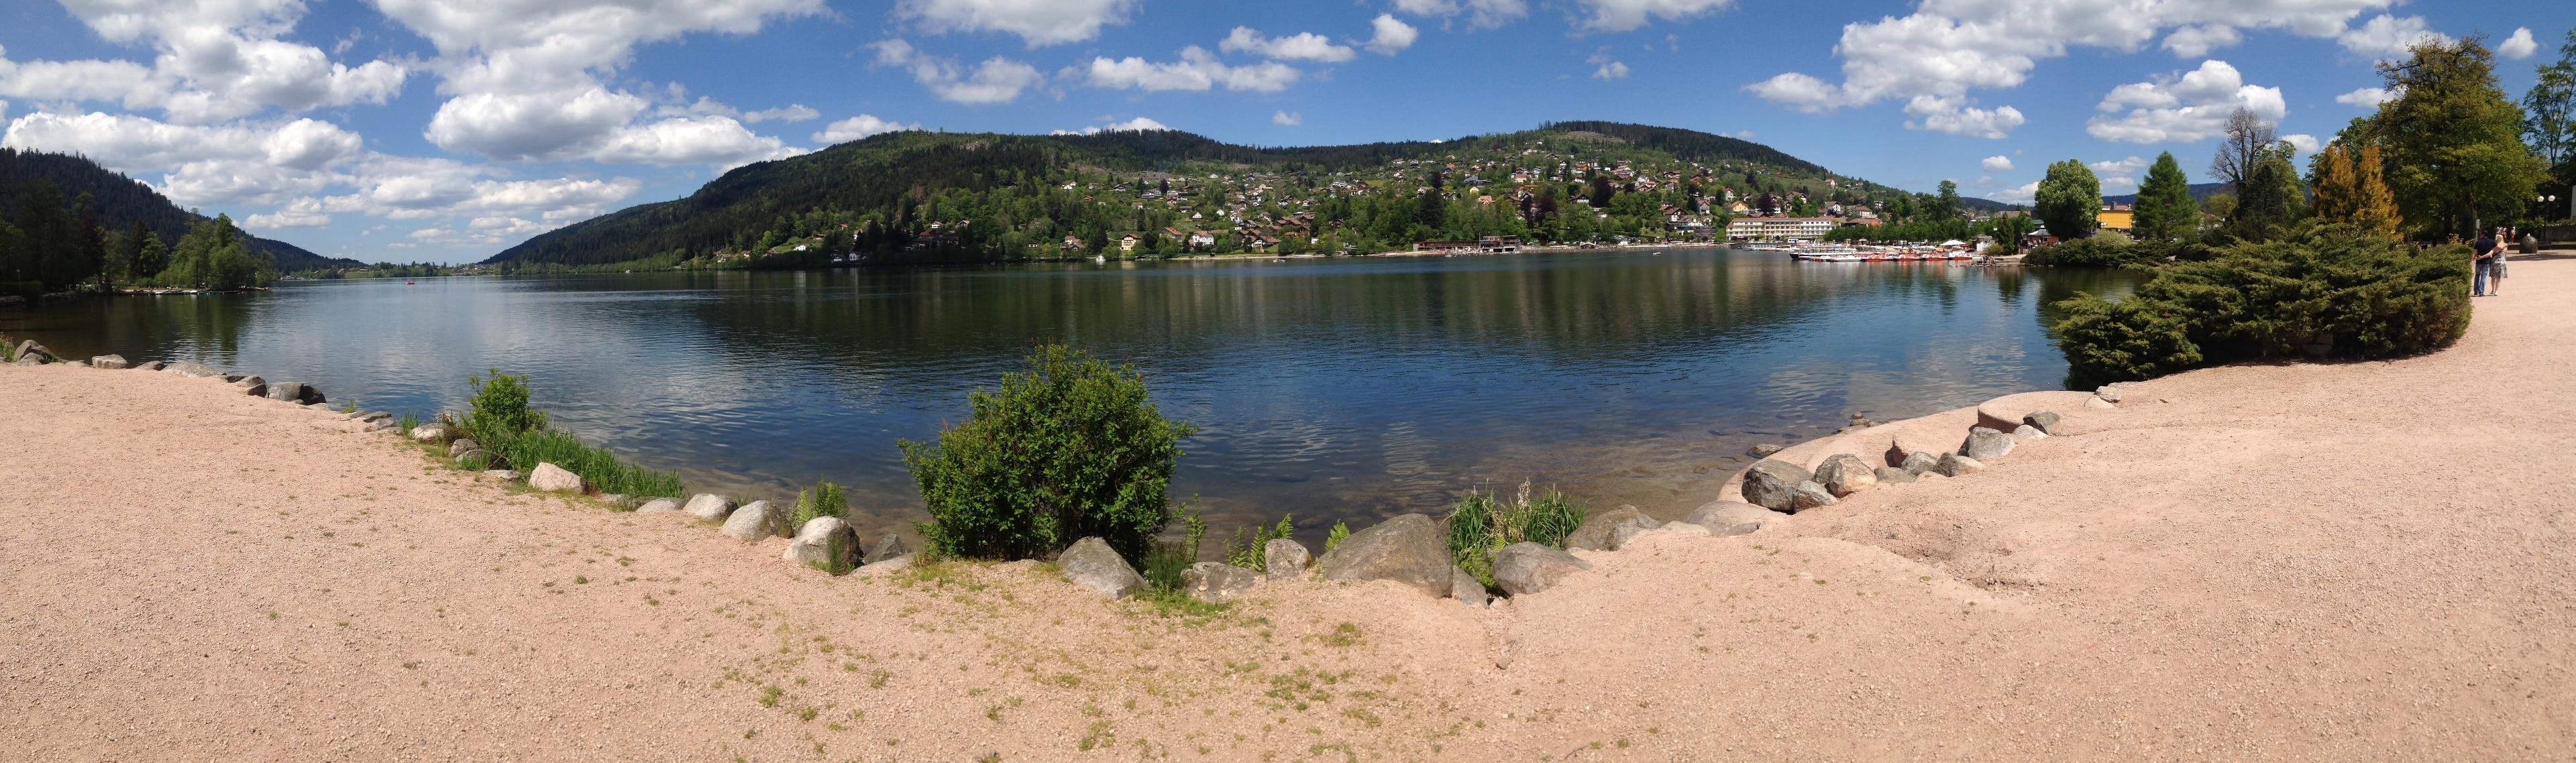 Lac de Gérardmer, Gerardmer, Vosges, France